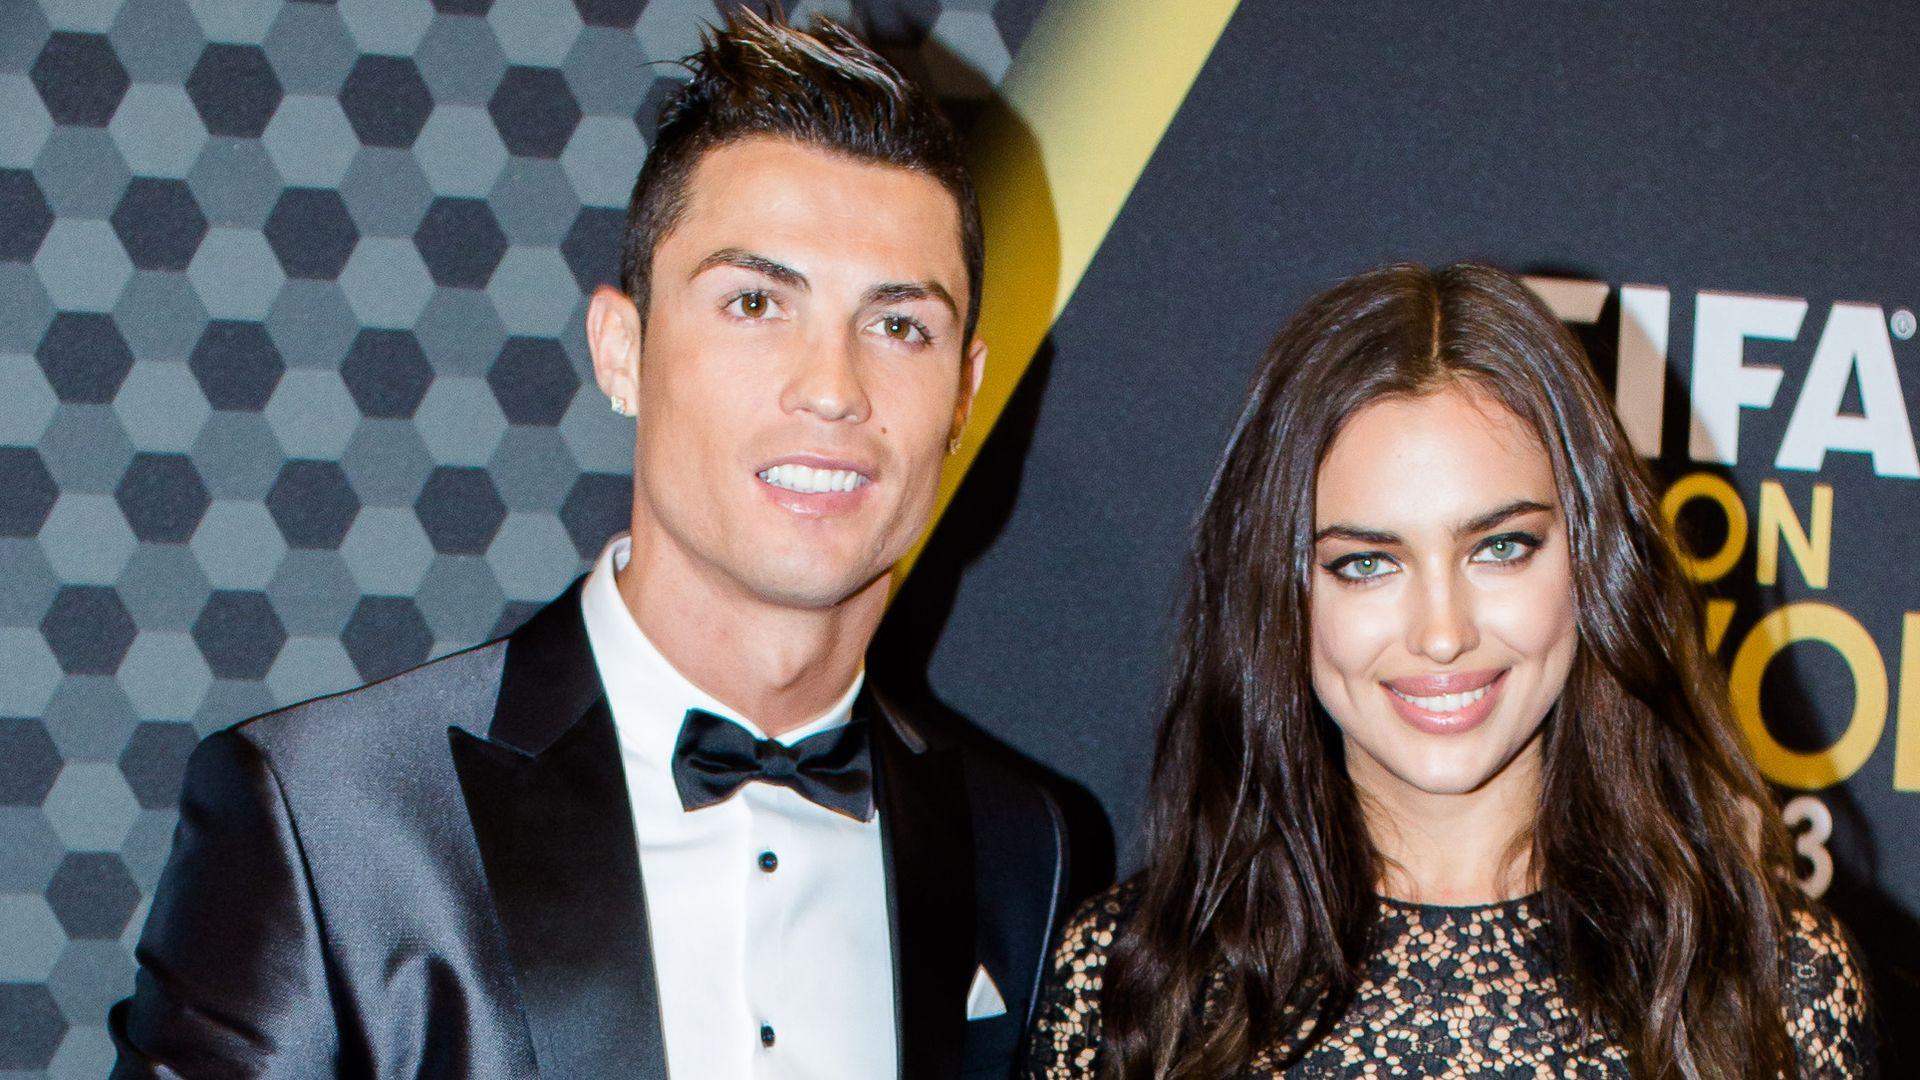 Ist Ronaldo Verheiratet